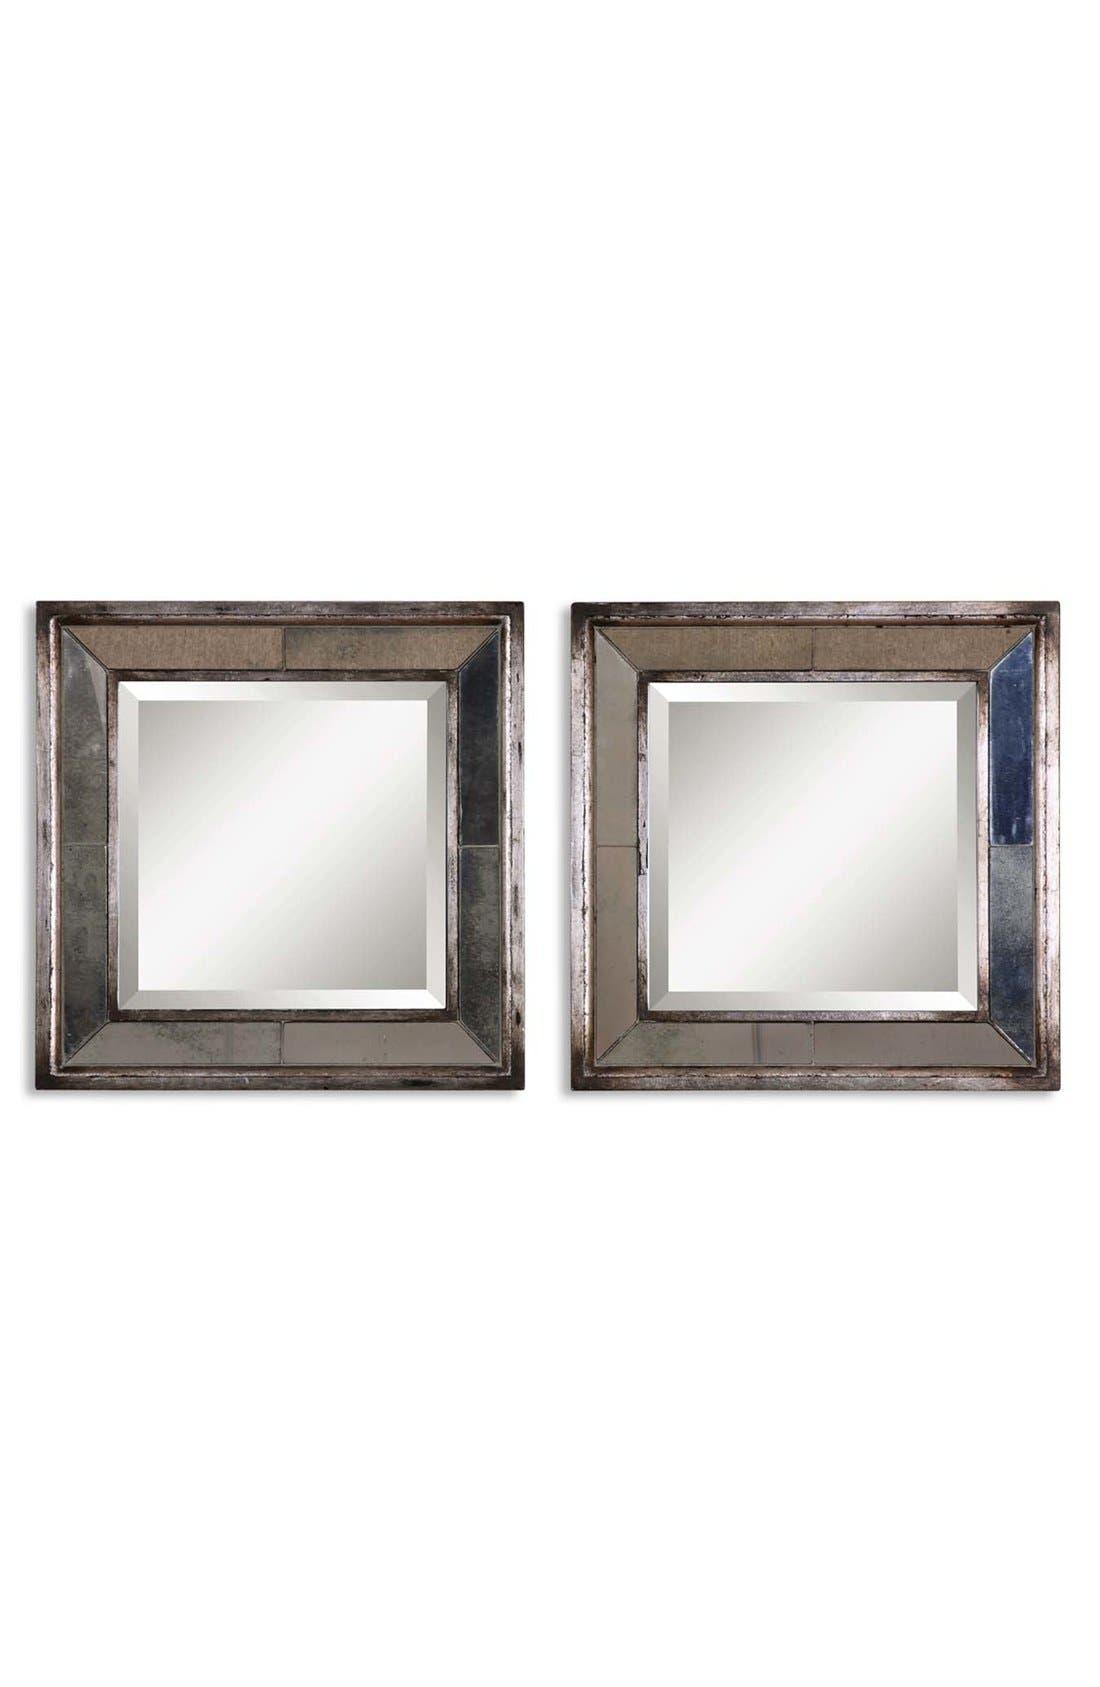 Main Image - Uttermost 'Davion' Square Mirror (Set of 2)